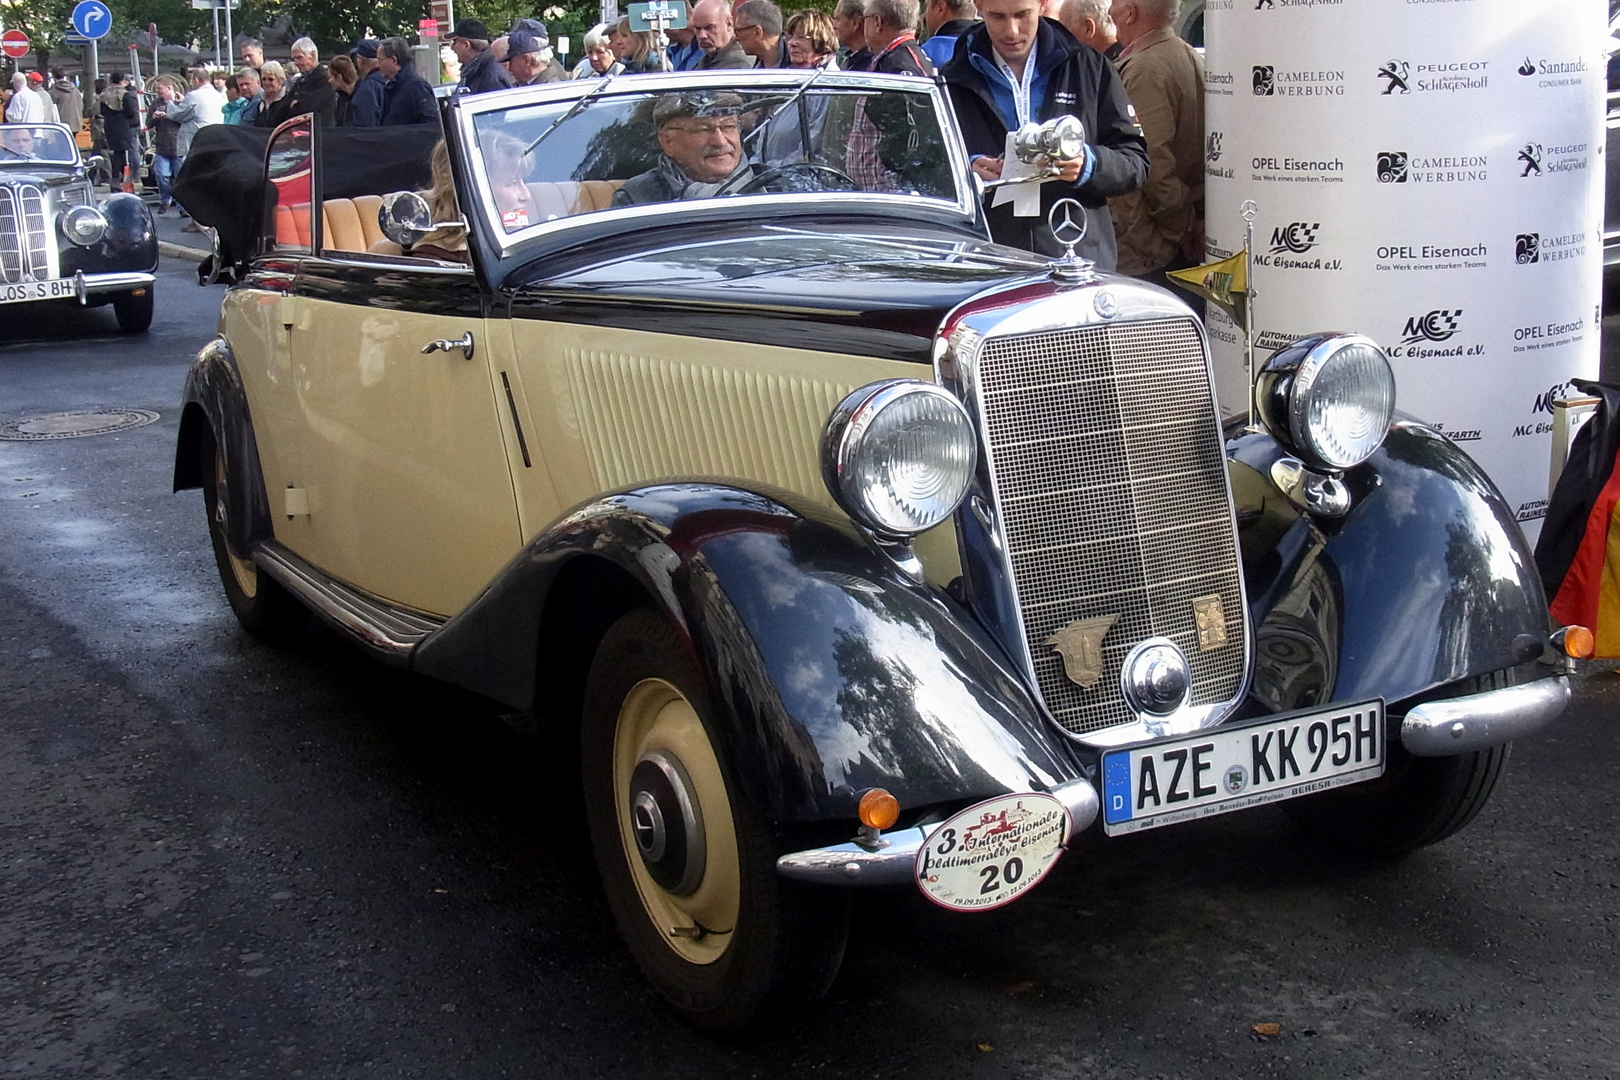 3. Oldtimer-Rallye 2013 in Eisenach - Mercedes Cabrio